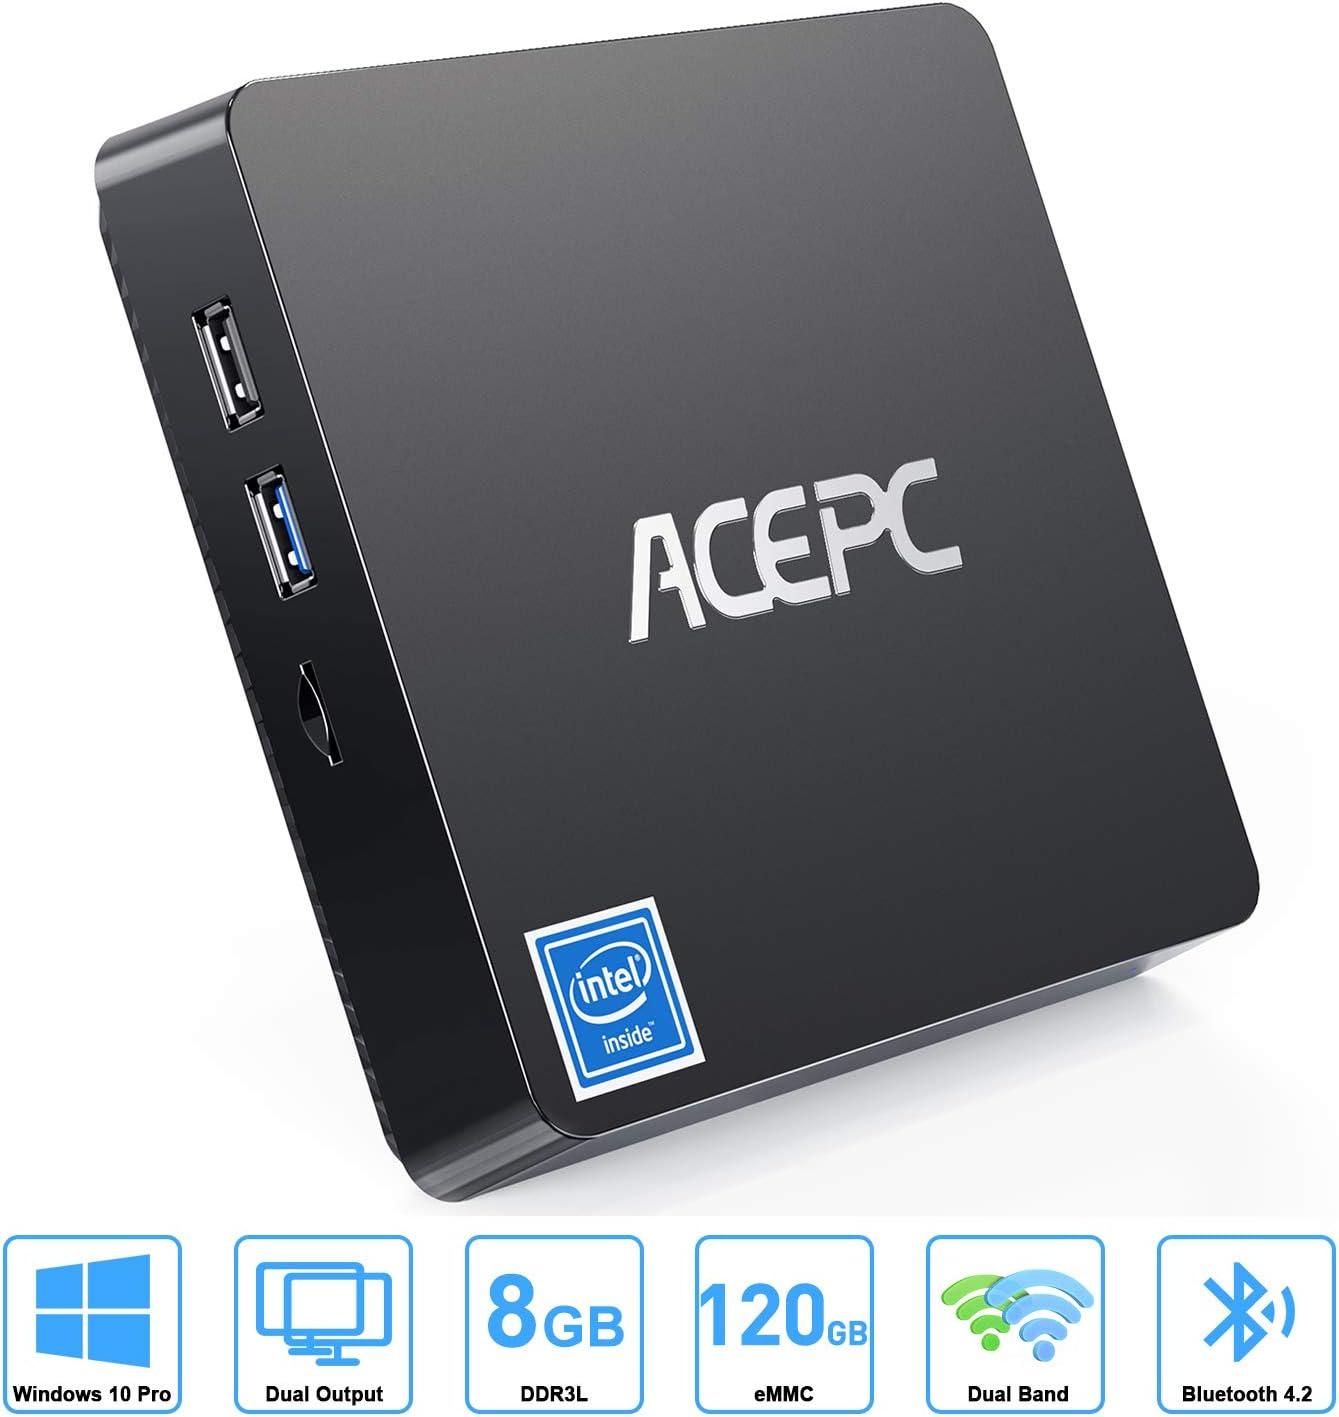 ACEPC T11 Mini PC, 8GB DDR3, 120GB eMMC, Windows 10 Pro Mini Computer,Intel Atom z8350 up to 1.9 GHz, Dual Display up to 4K HD,Bluetooth 4.2,Gigabit LAN,Dual Band WiFi